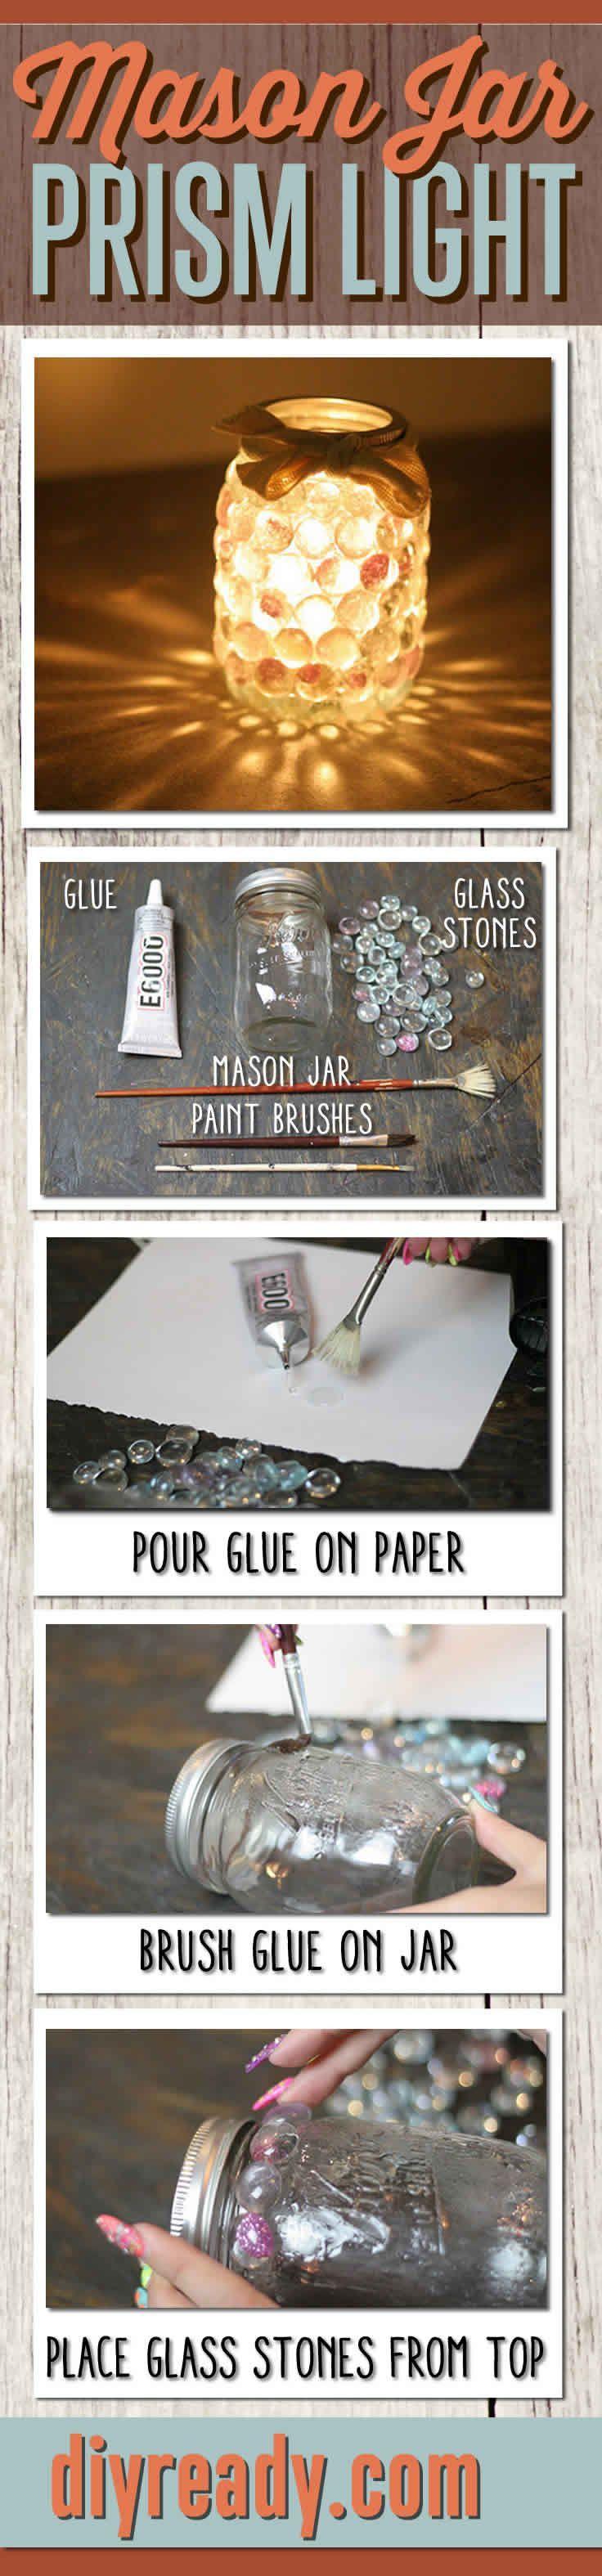 Mason Jar Dollar Store Craft - Easy DIY Prism Light #diy #masonjar #crafts http://diyready.com/mason-jar-crafts-prism-candle-light/